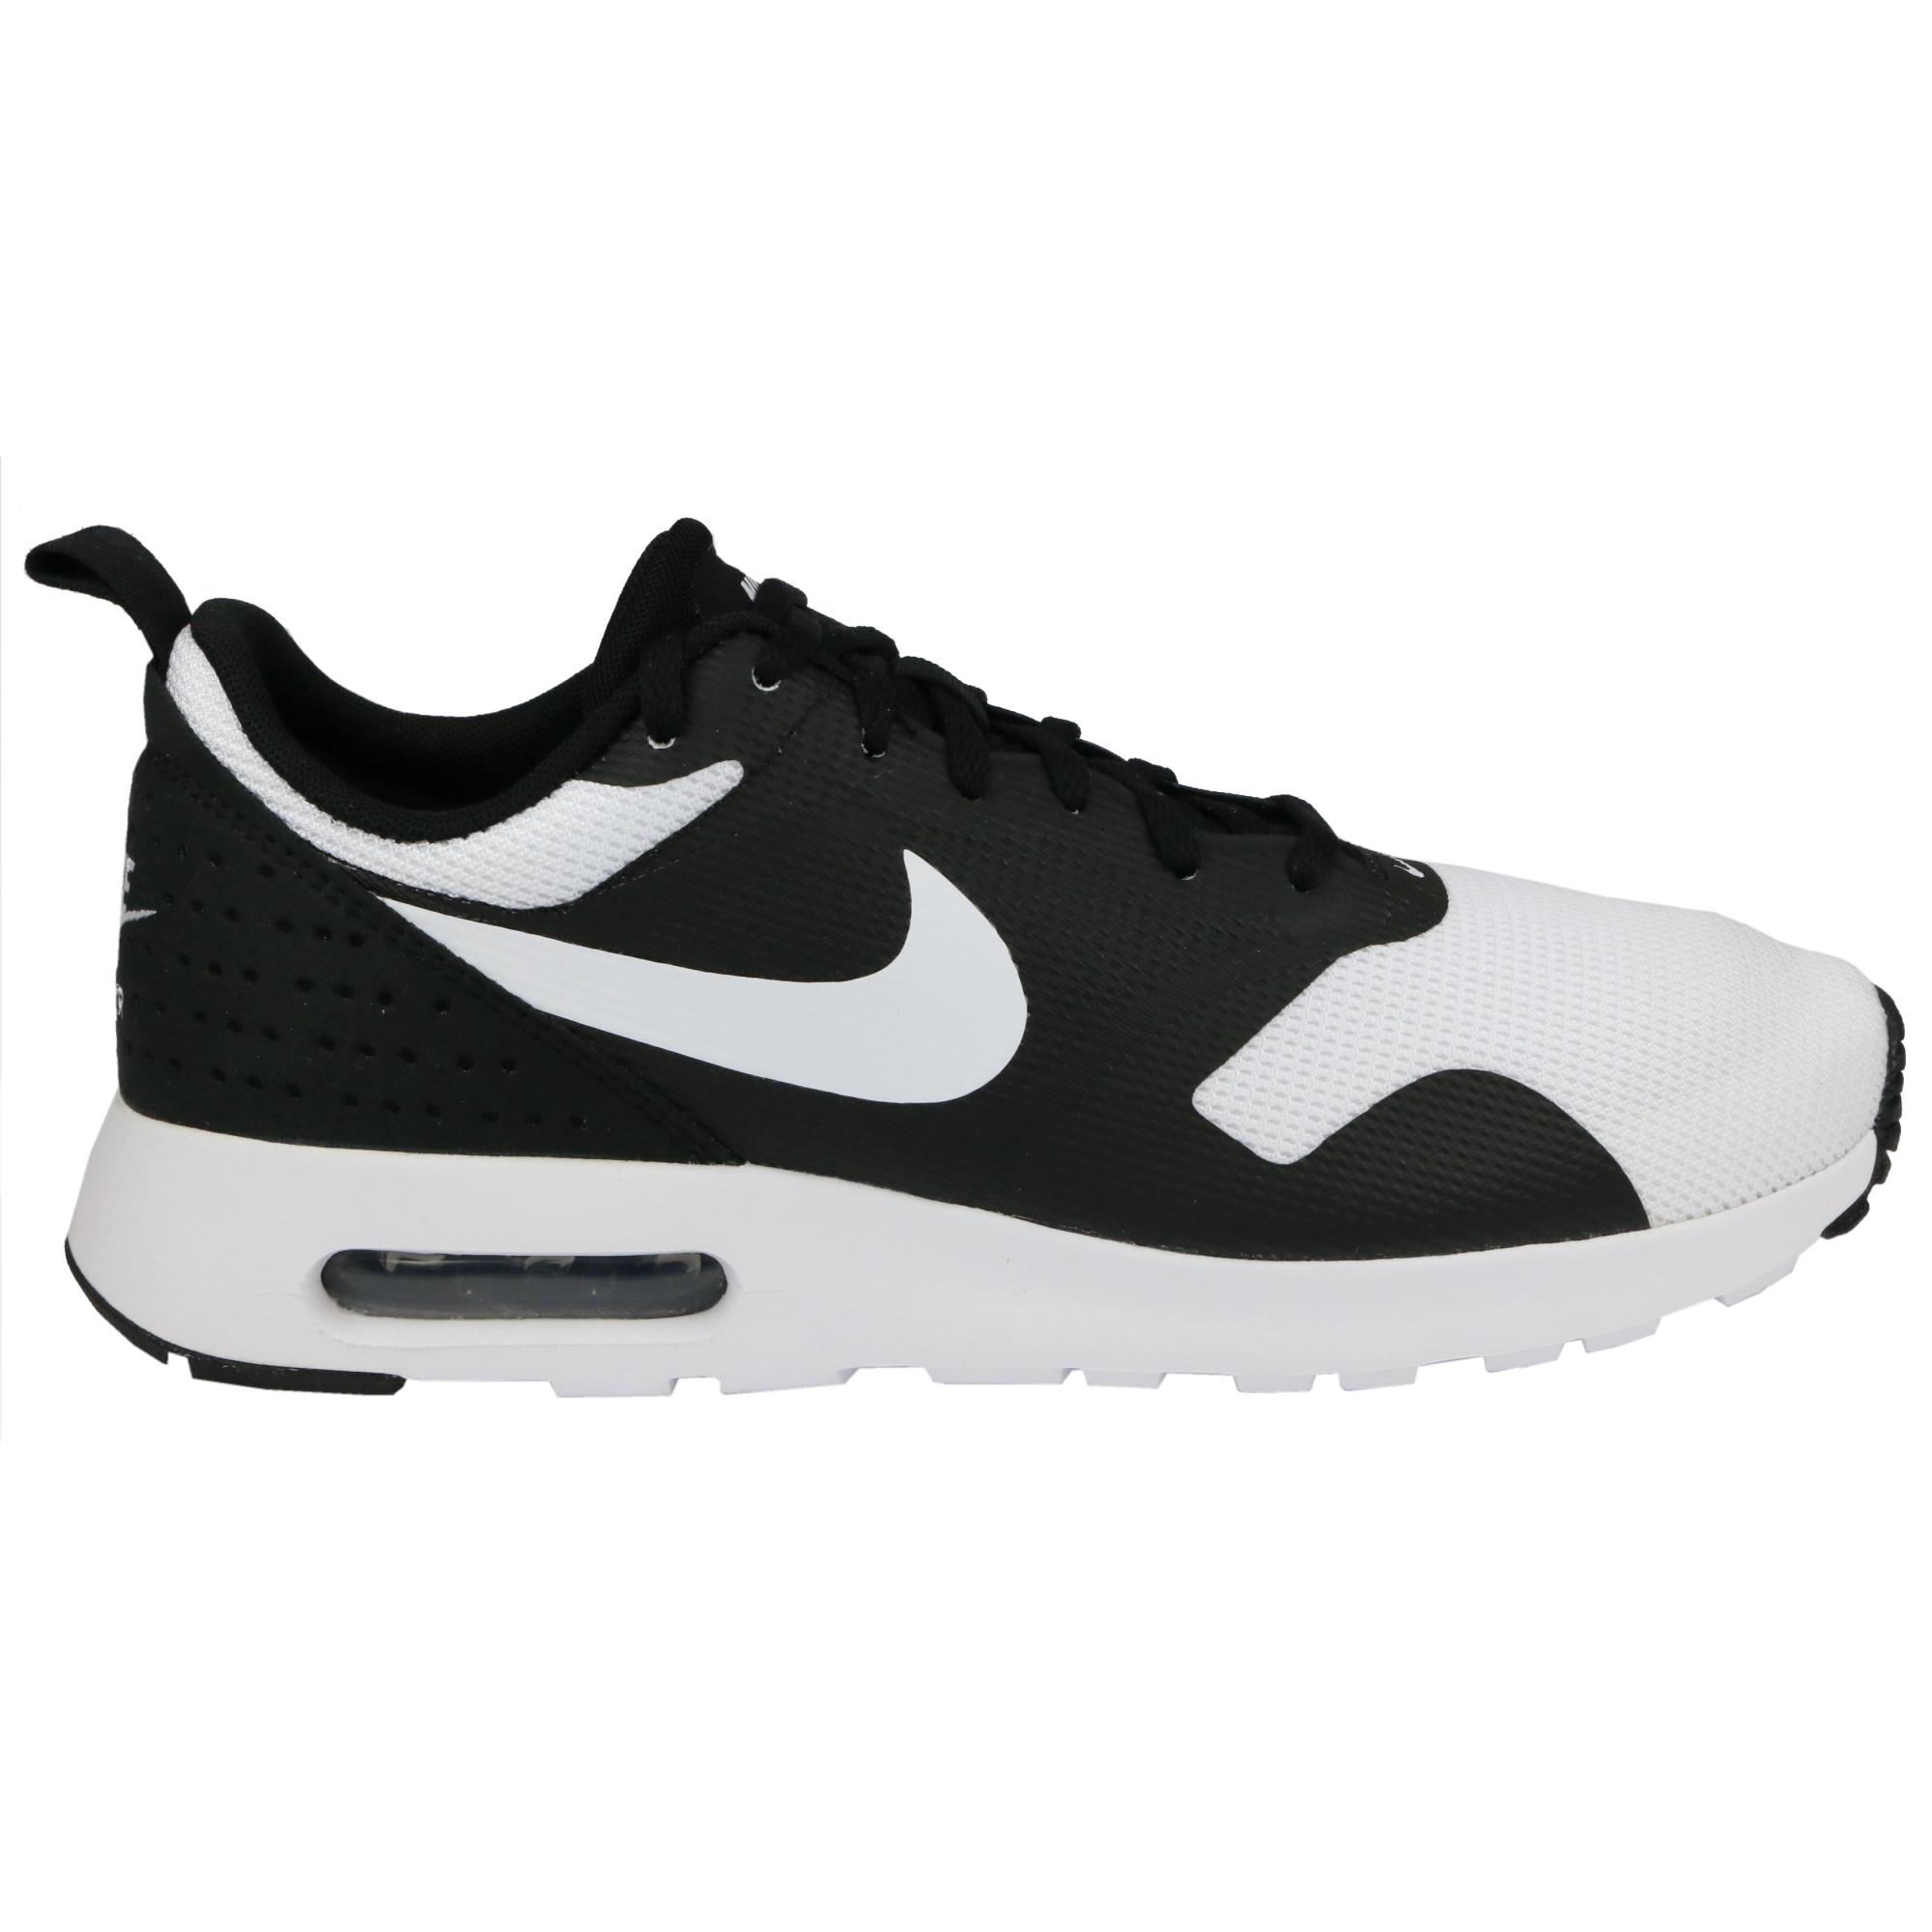 nike sportswear air max tavas essential - baskets basses - black/white